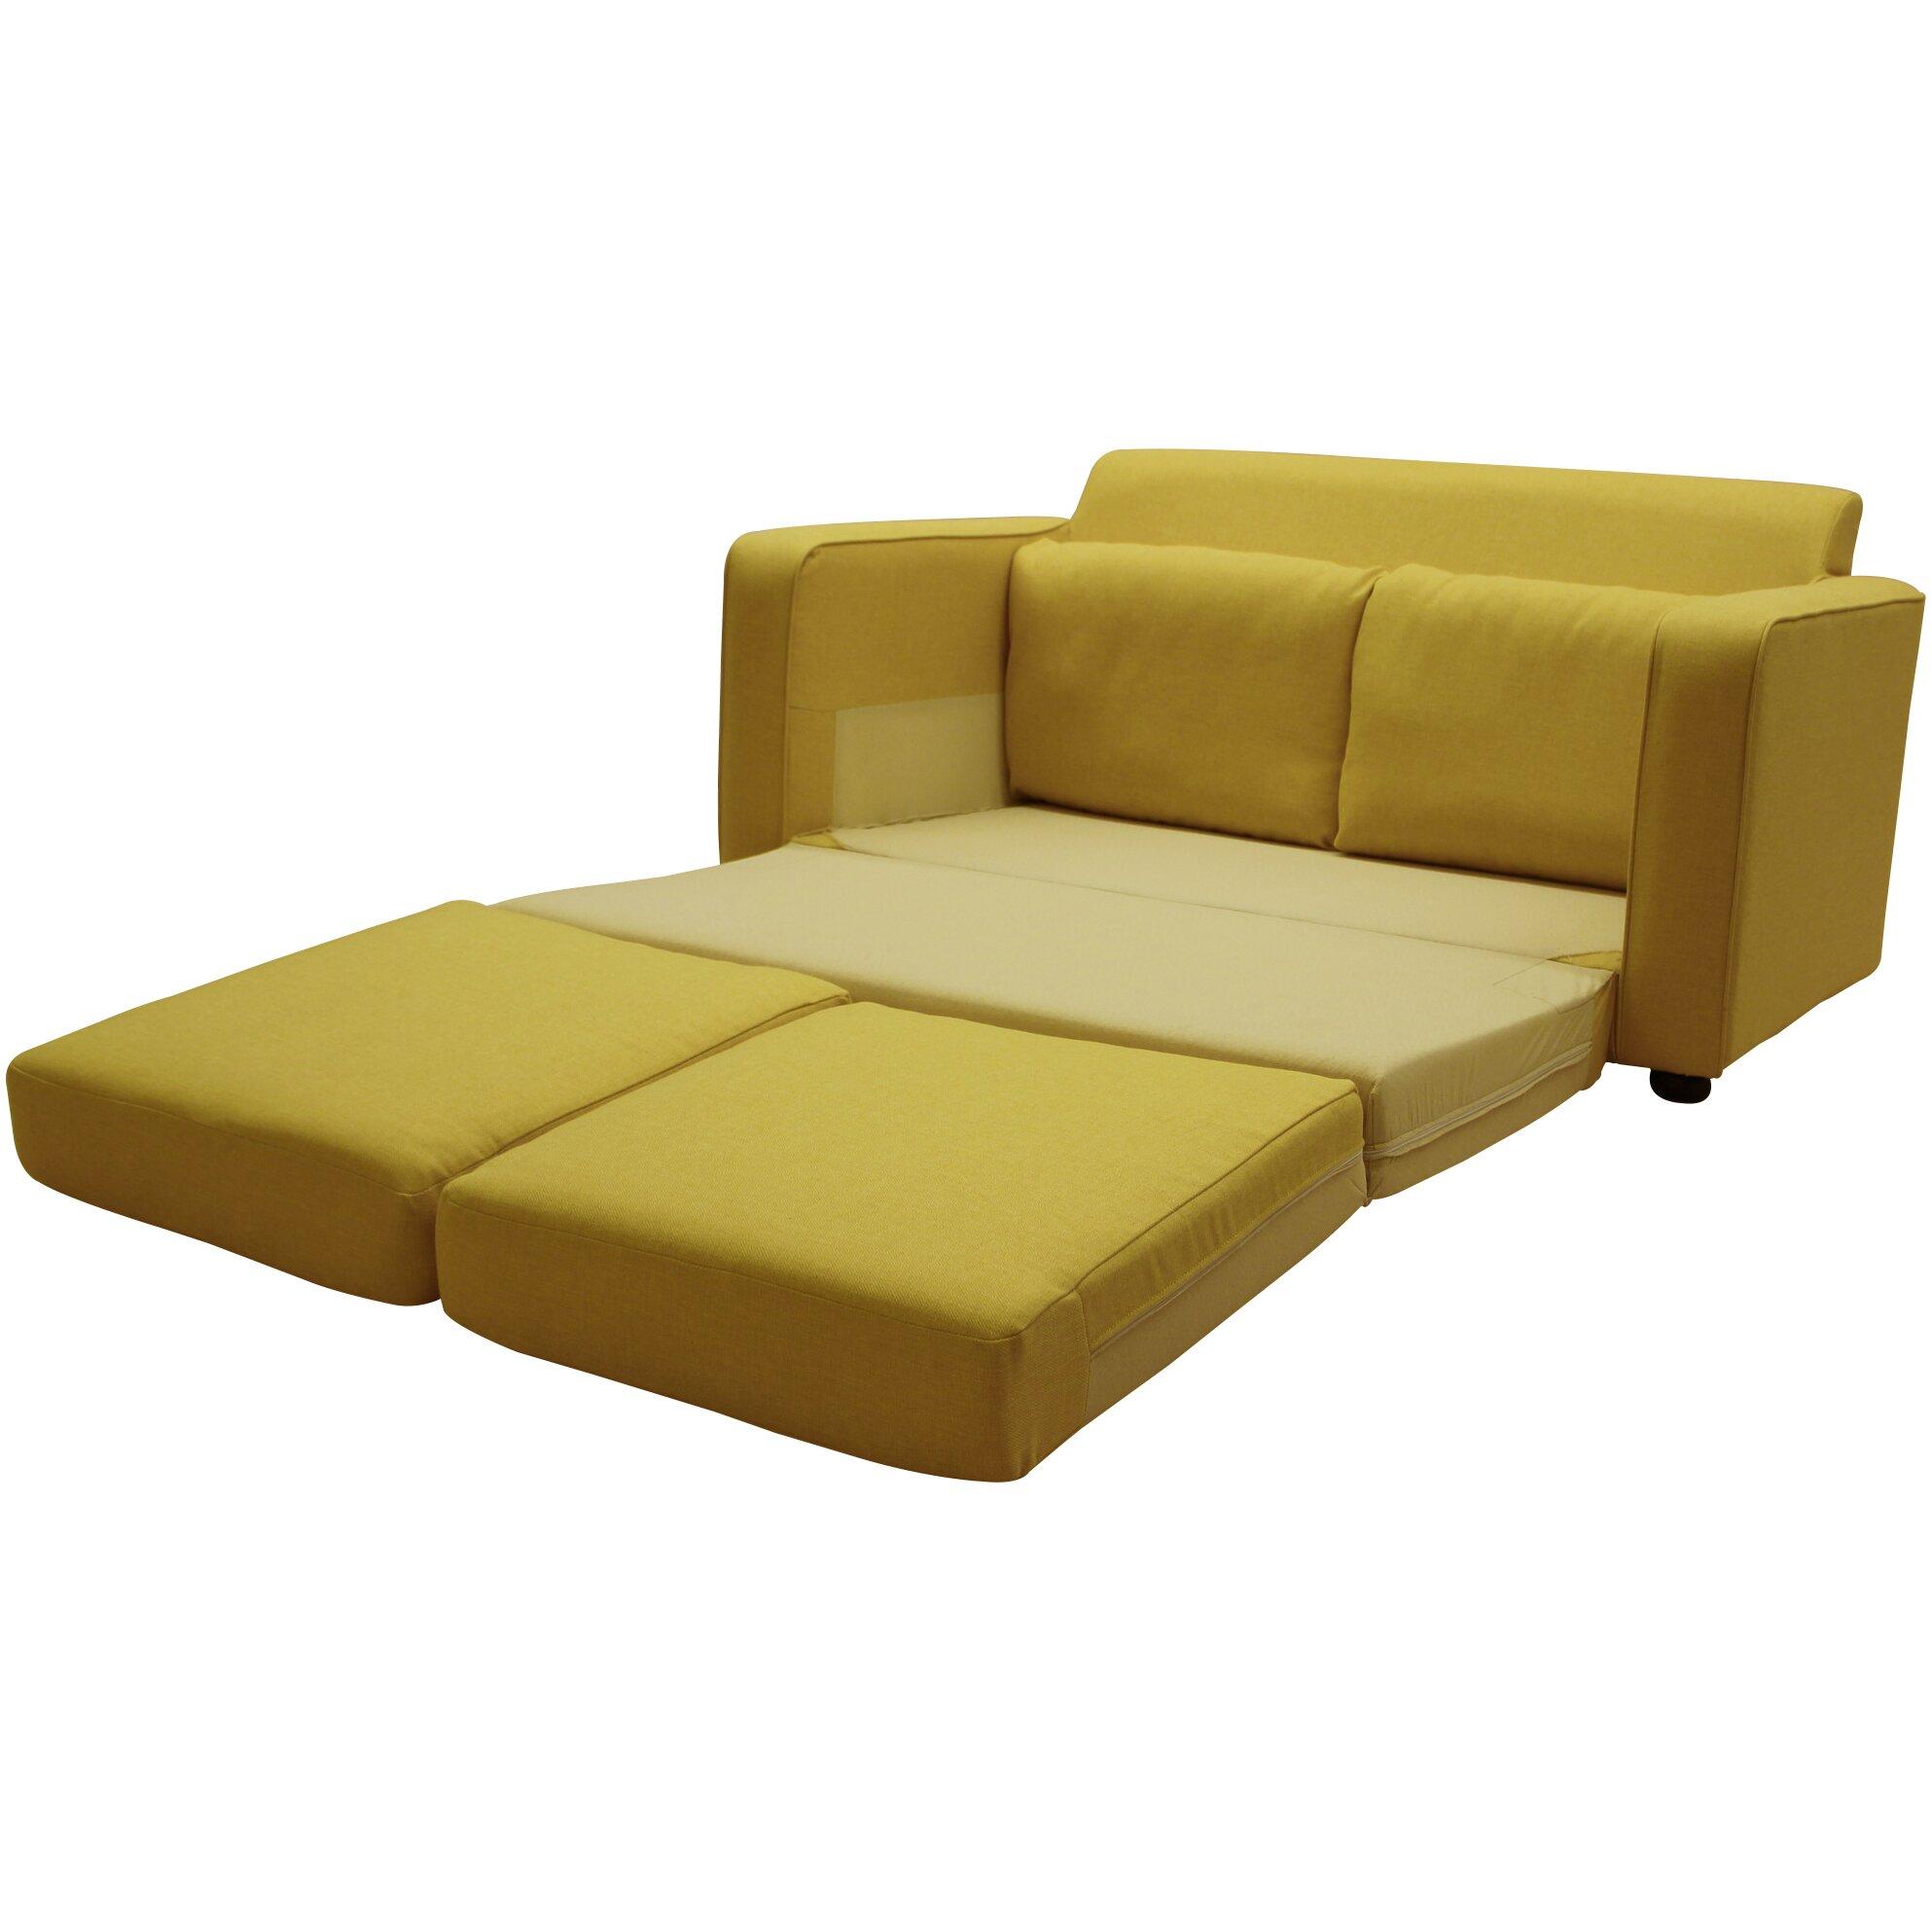 Lightweight Sleeper Sofa Hereo